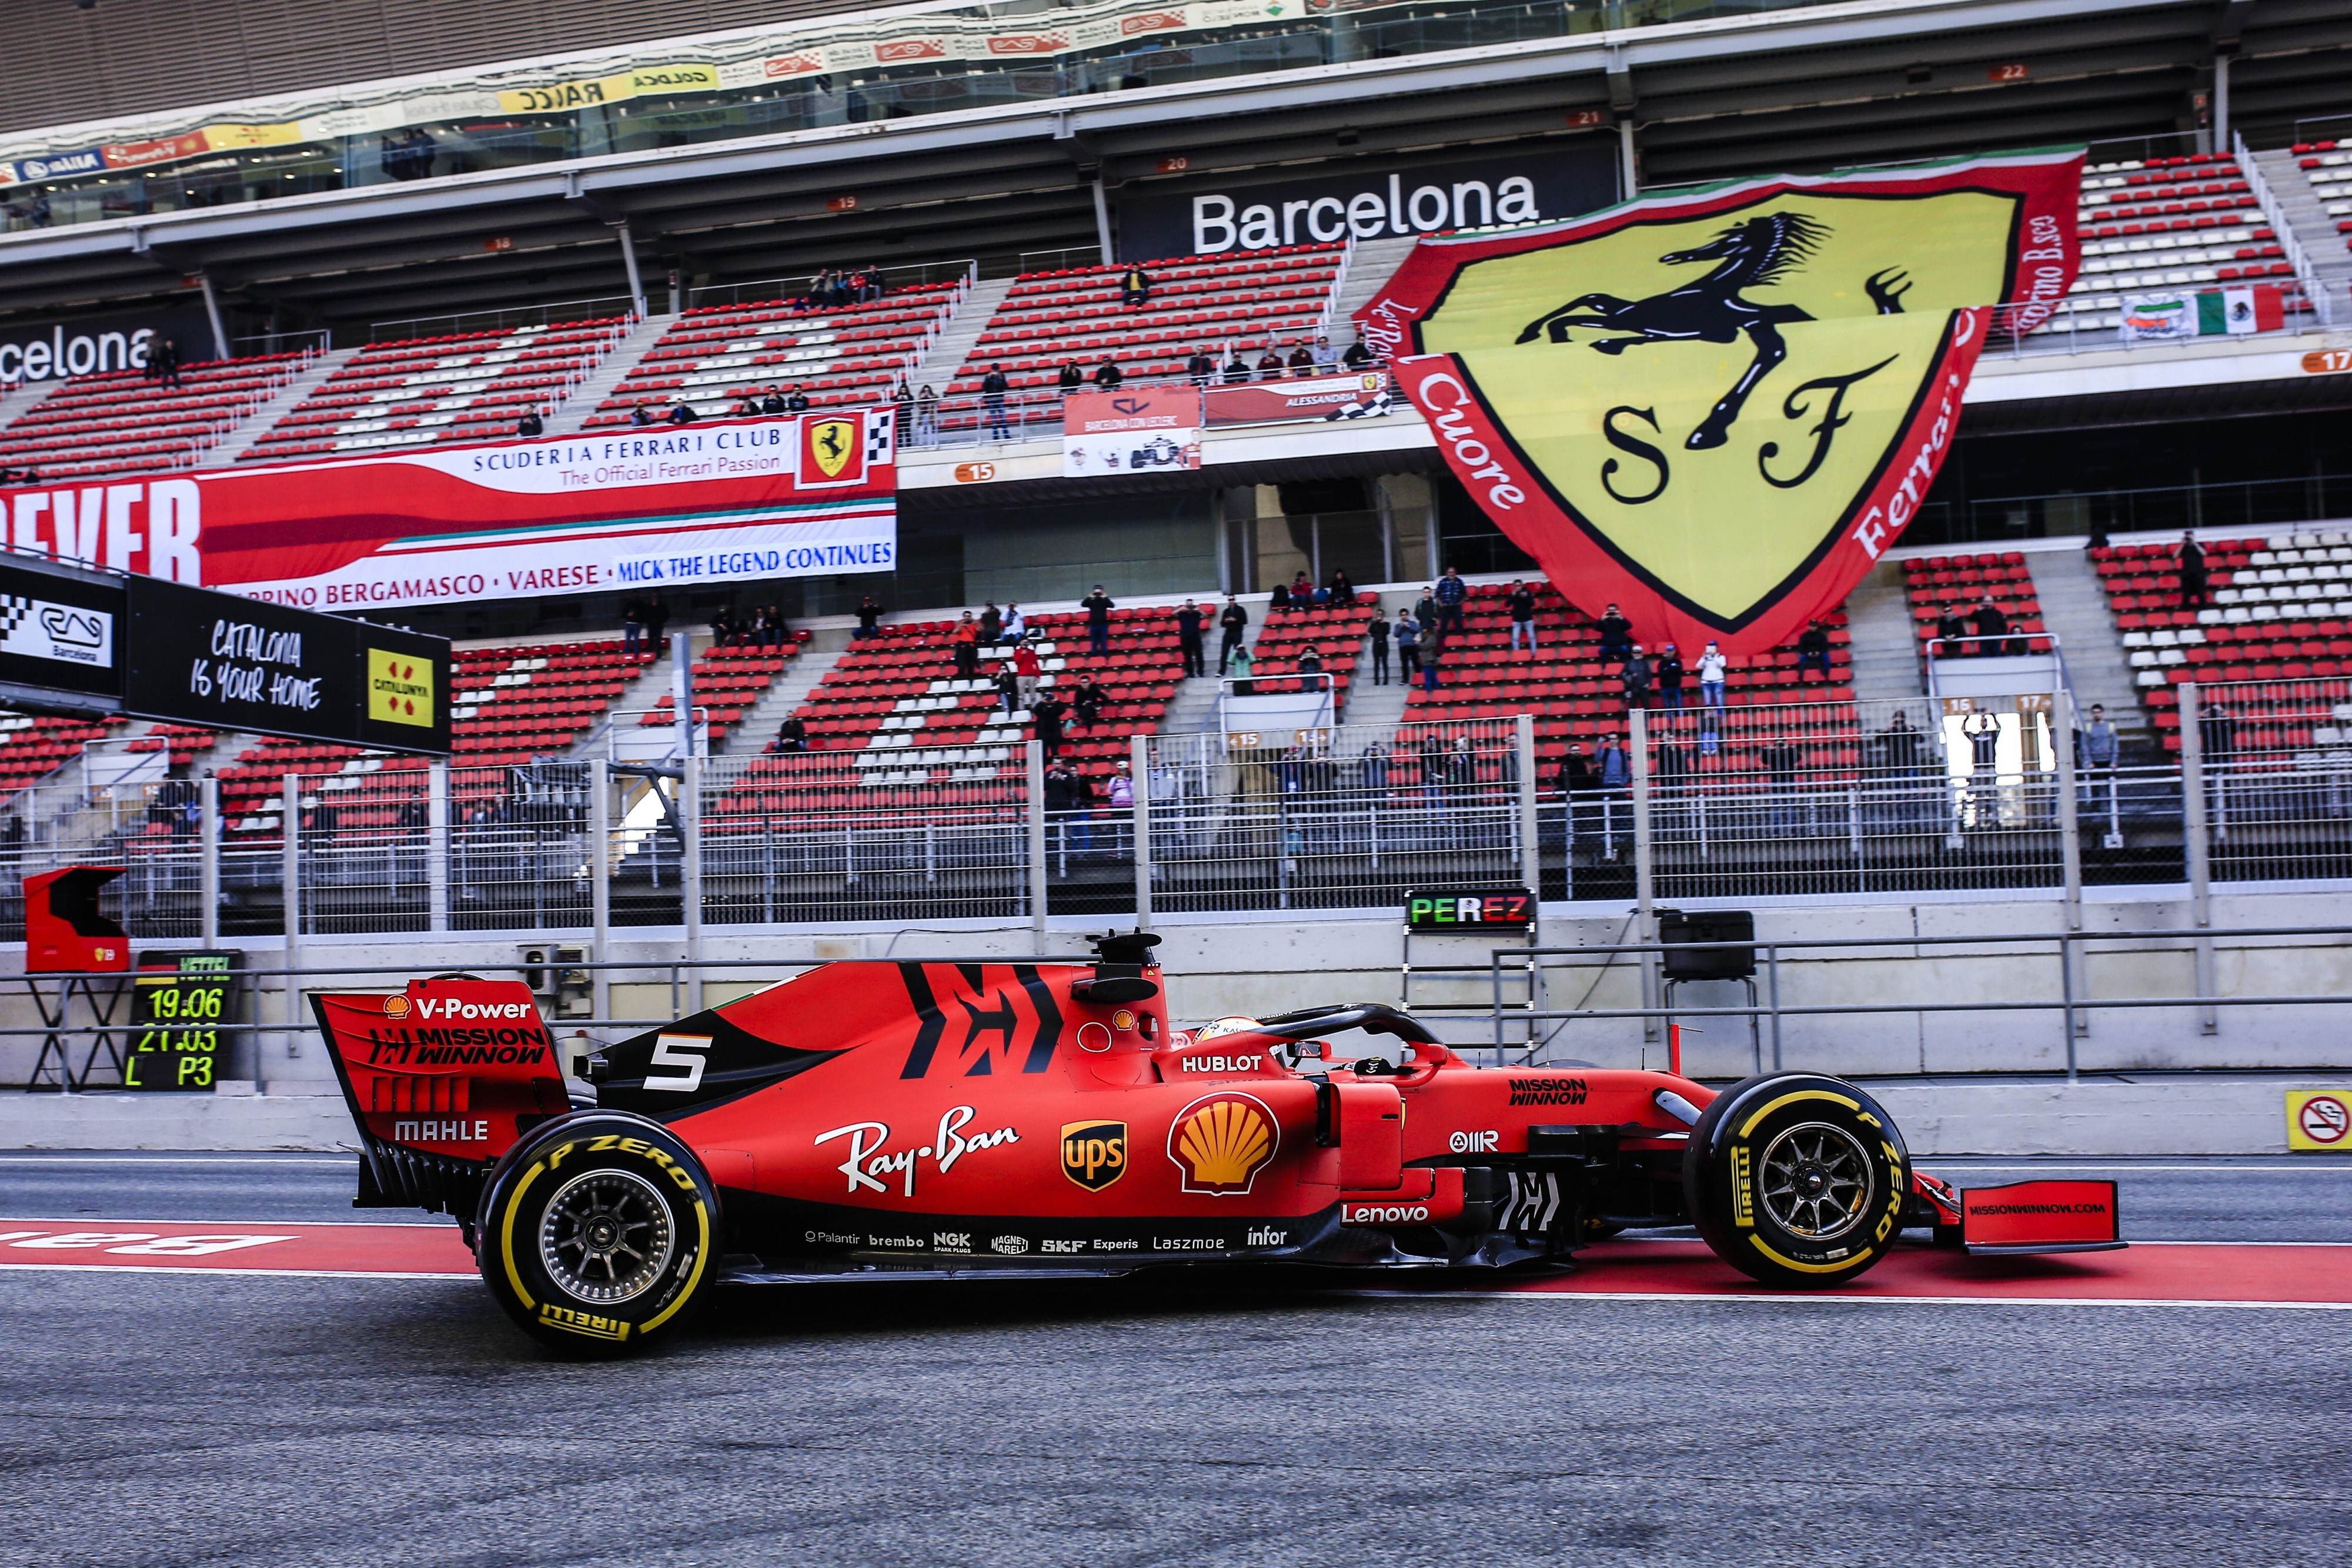 Sebastian Vettel (Ferrari) - Tests 2 Montmelo 2019